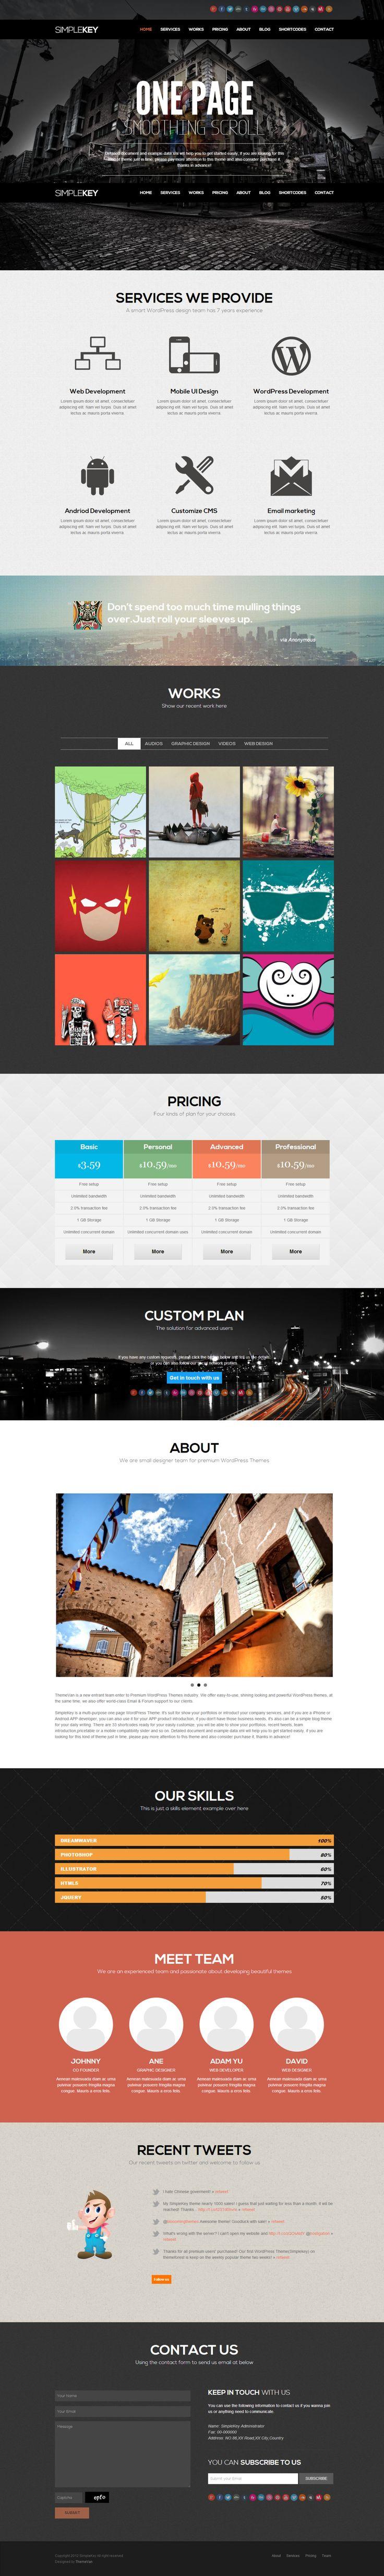 SimpleKey - One Page Portfolio #WordPress Theme http://themeforest.net/item/simplekey-one-page-portfolio-wordpress-theme/3729774?ref=wpaw #wp #web #design